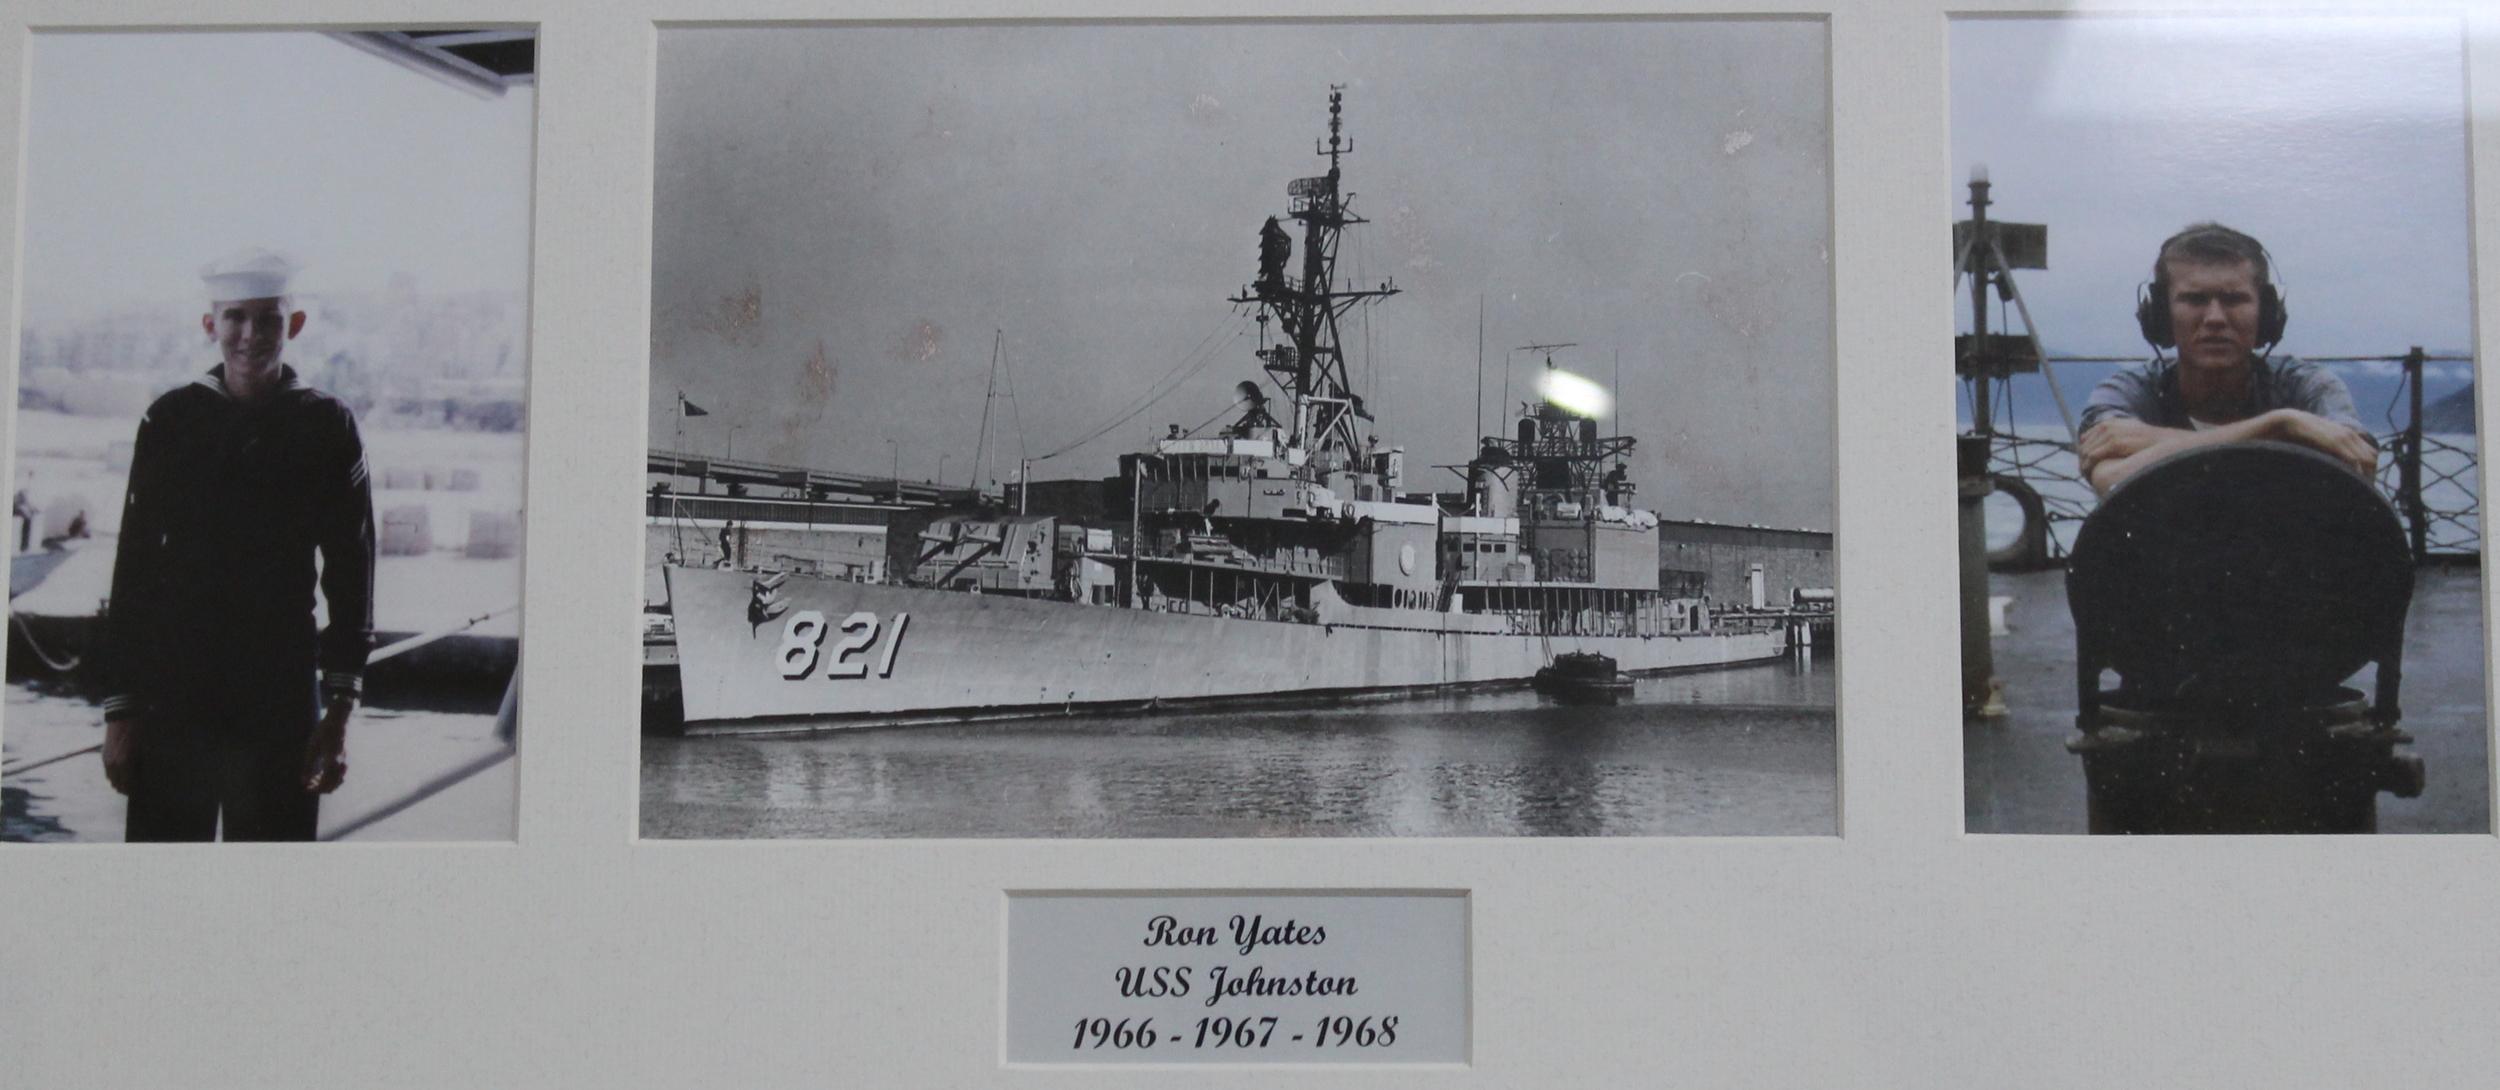 Ron Yates aboard the USS Johnston